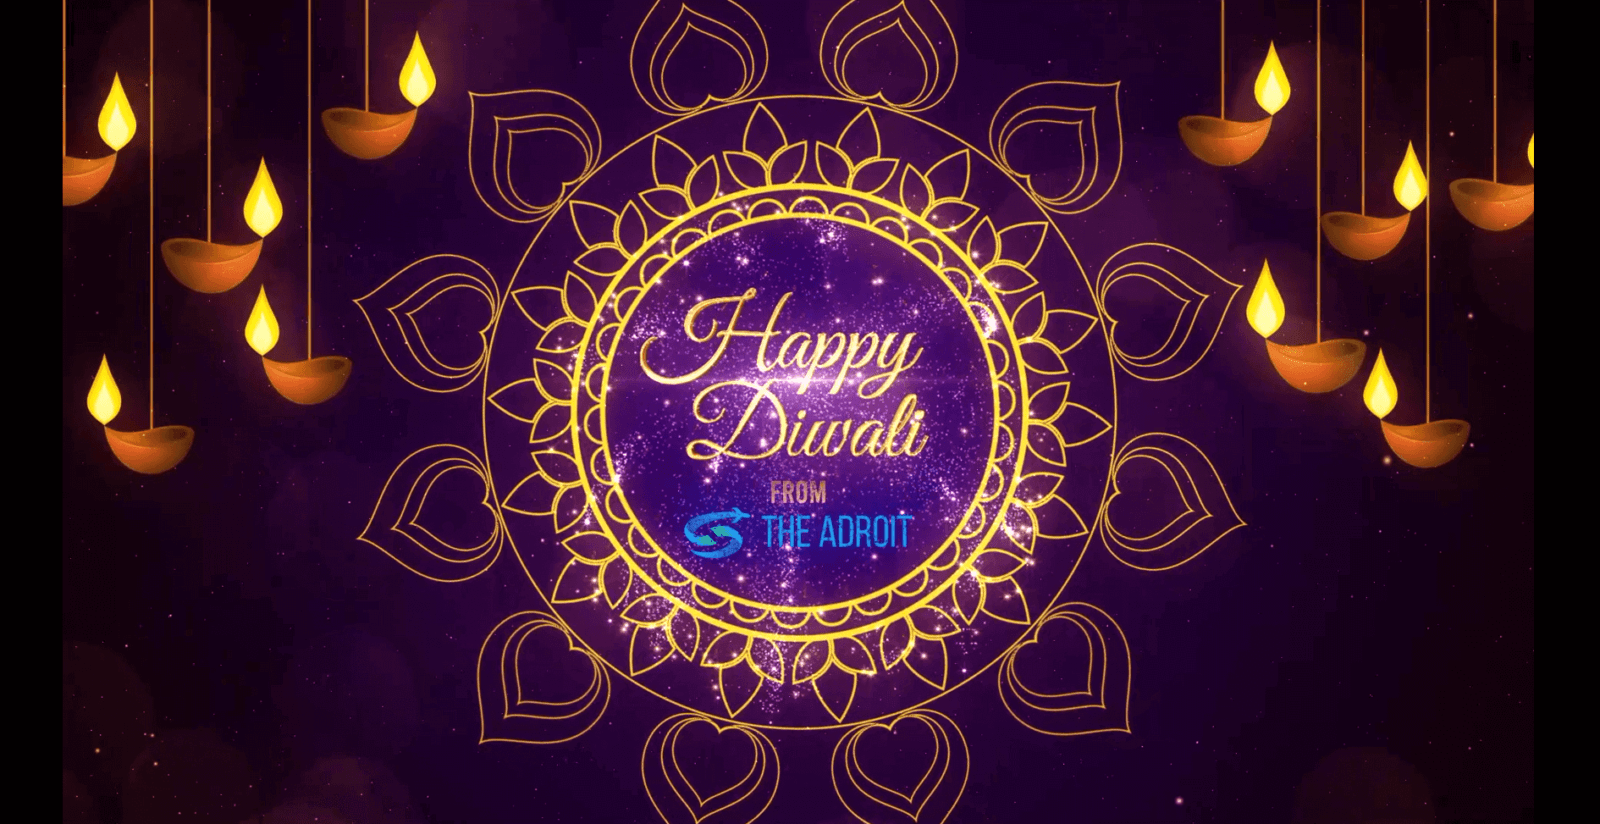 Happy Diwali 2020 - The Adroit